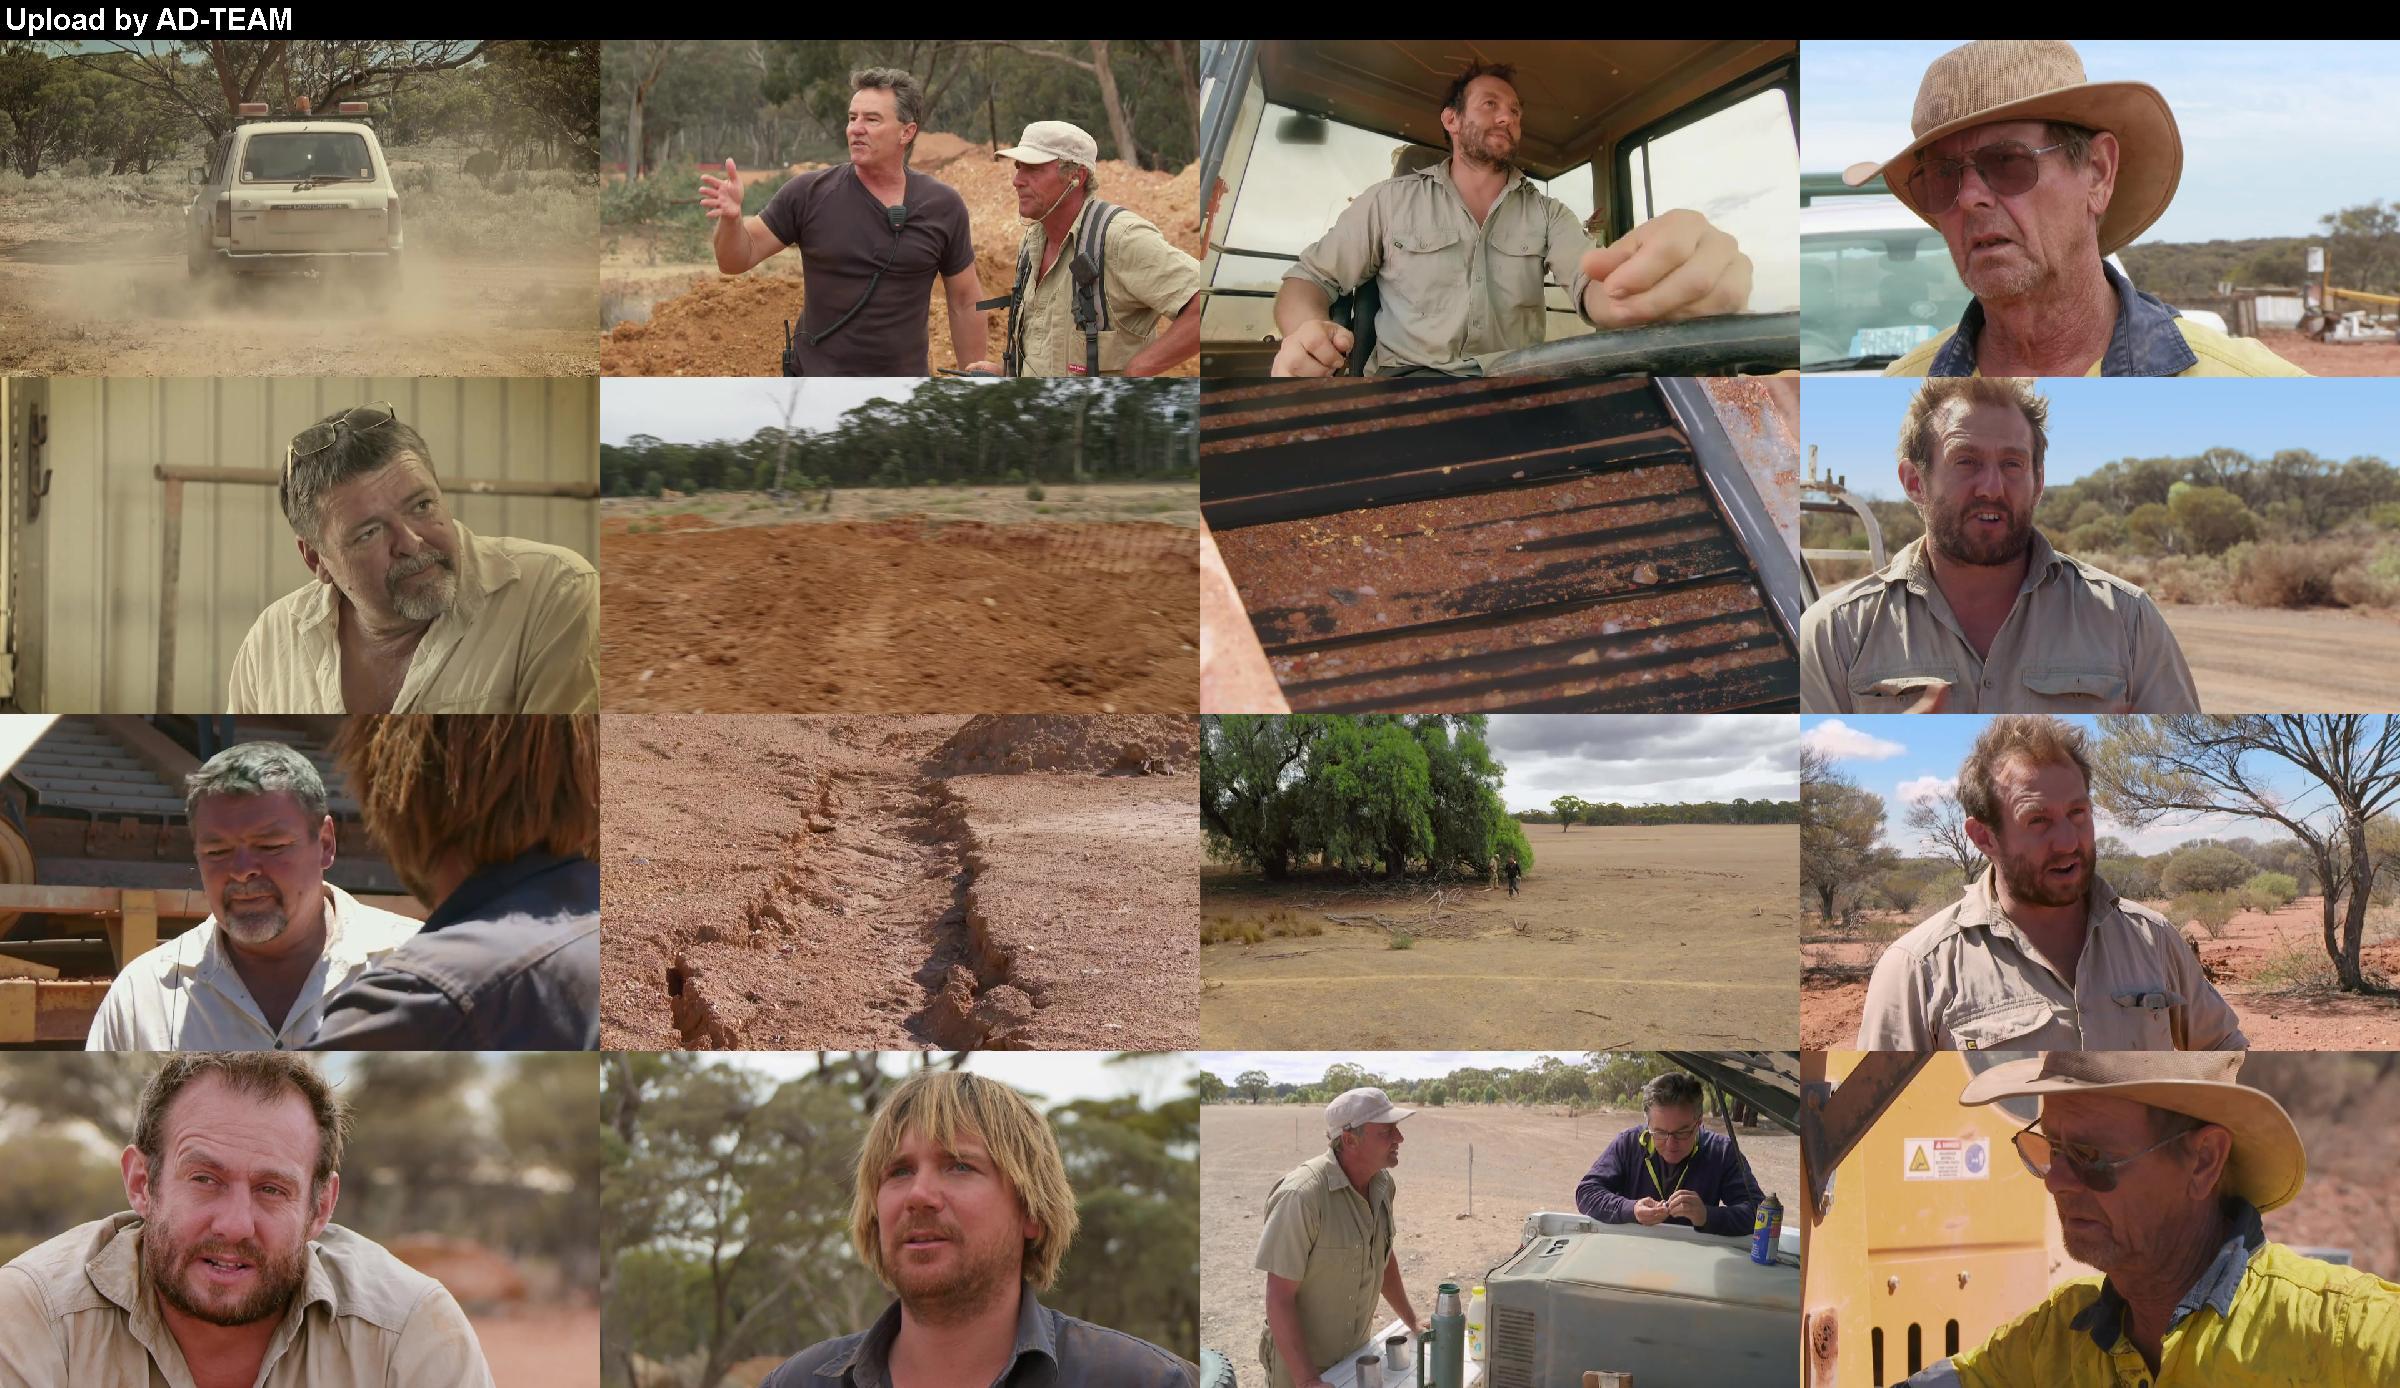 Aussie Gold Hunters S04e11 Web X264-ligate